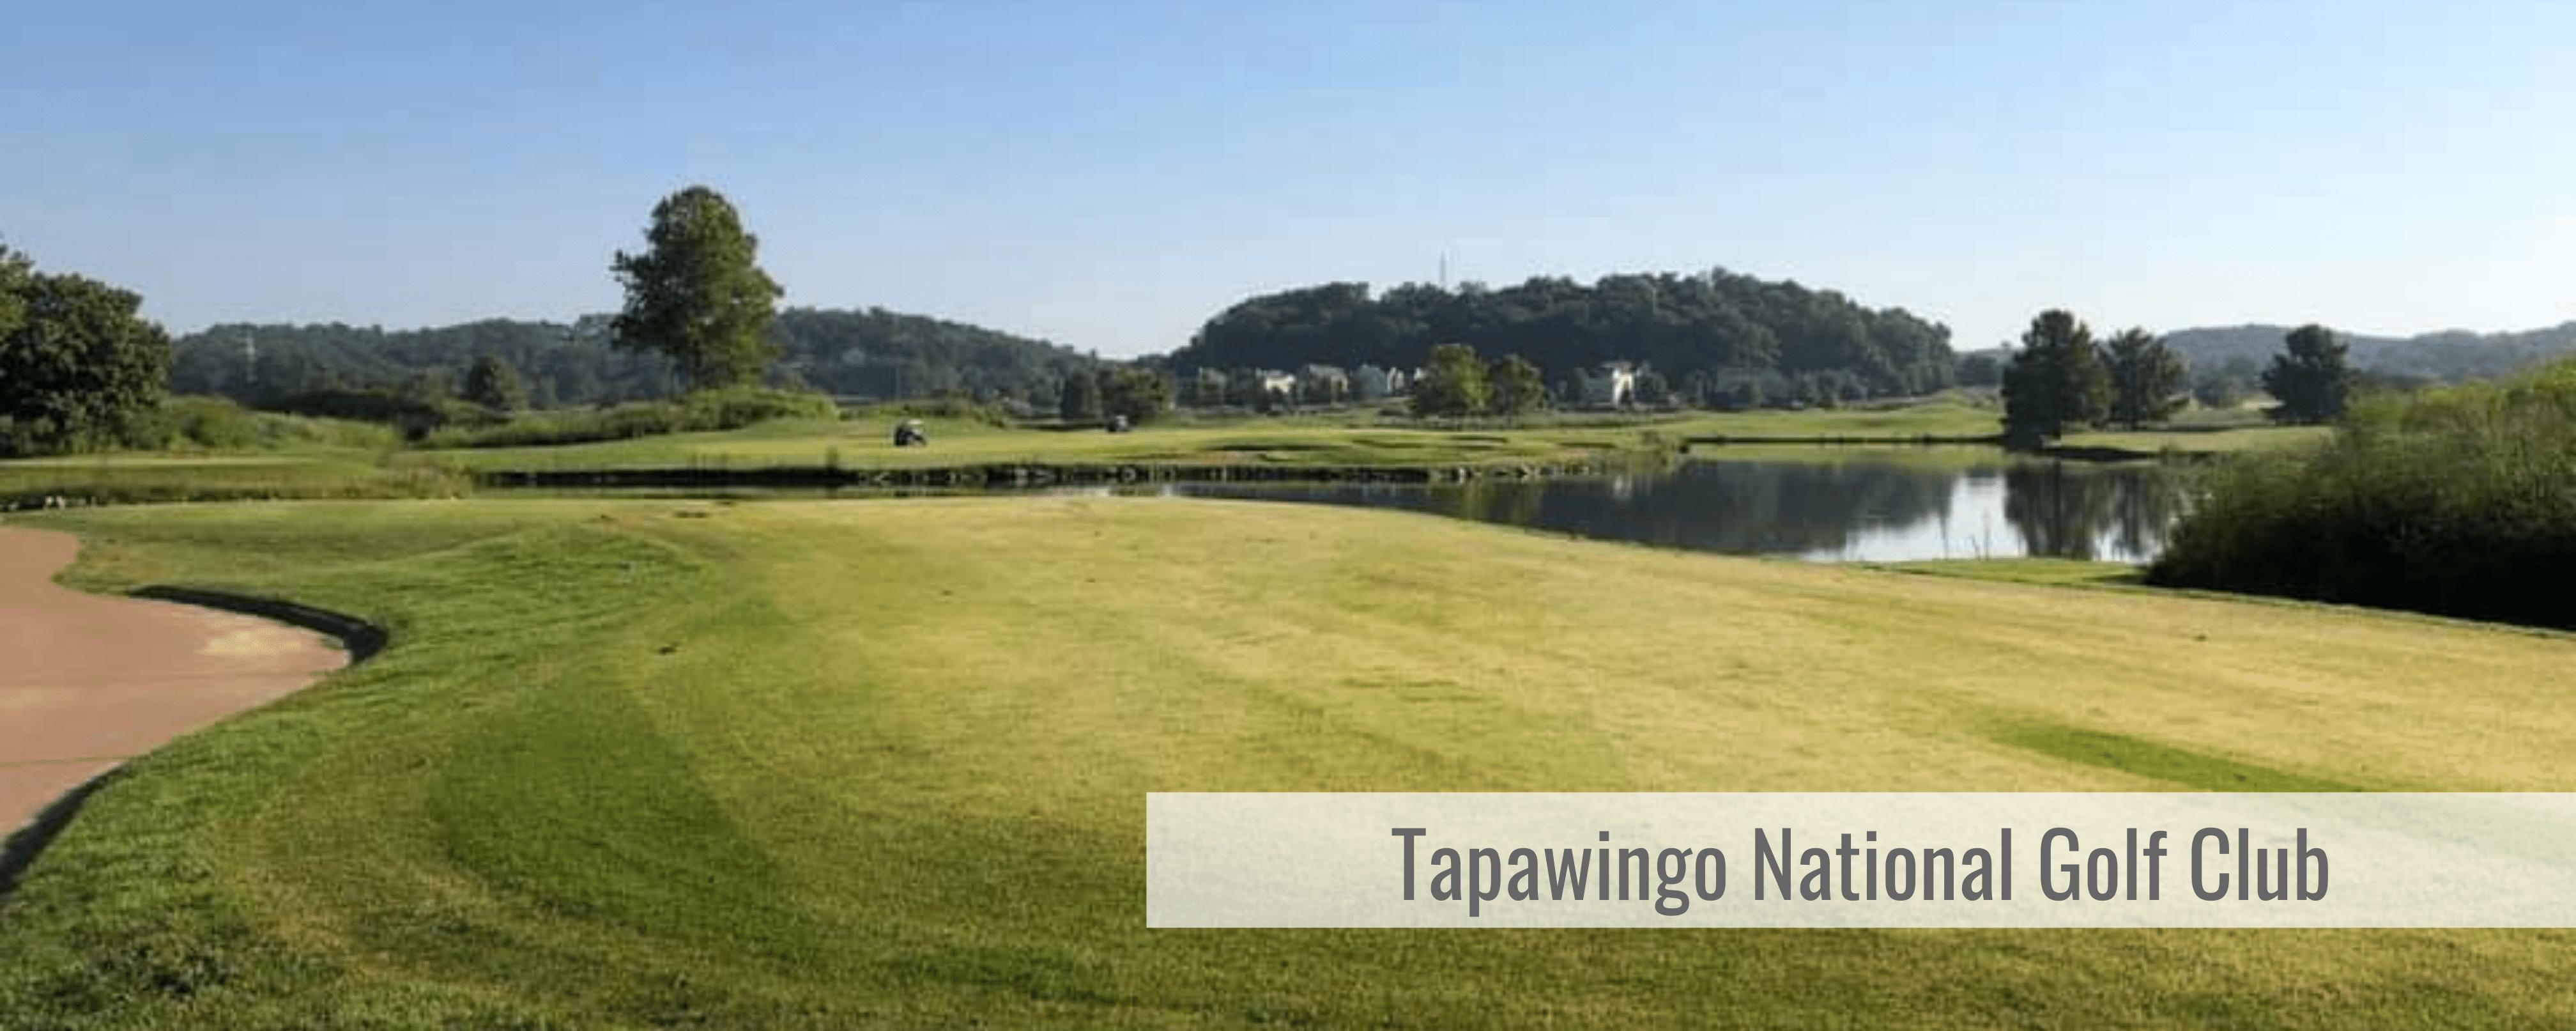 Tapawingo Golf Club